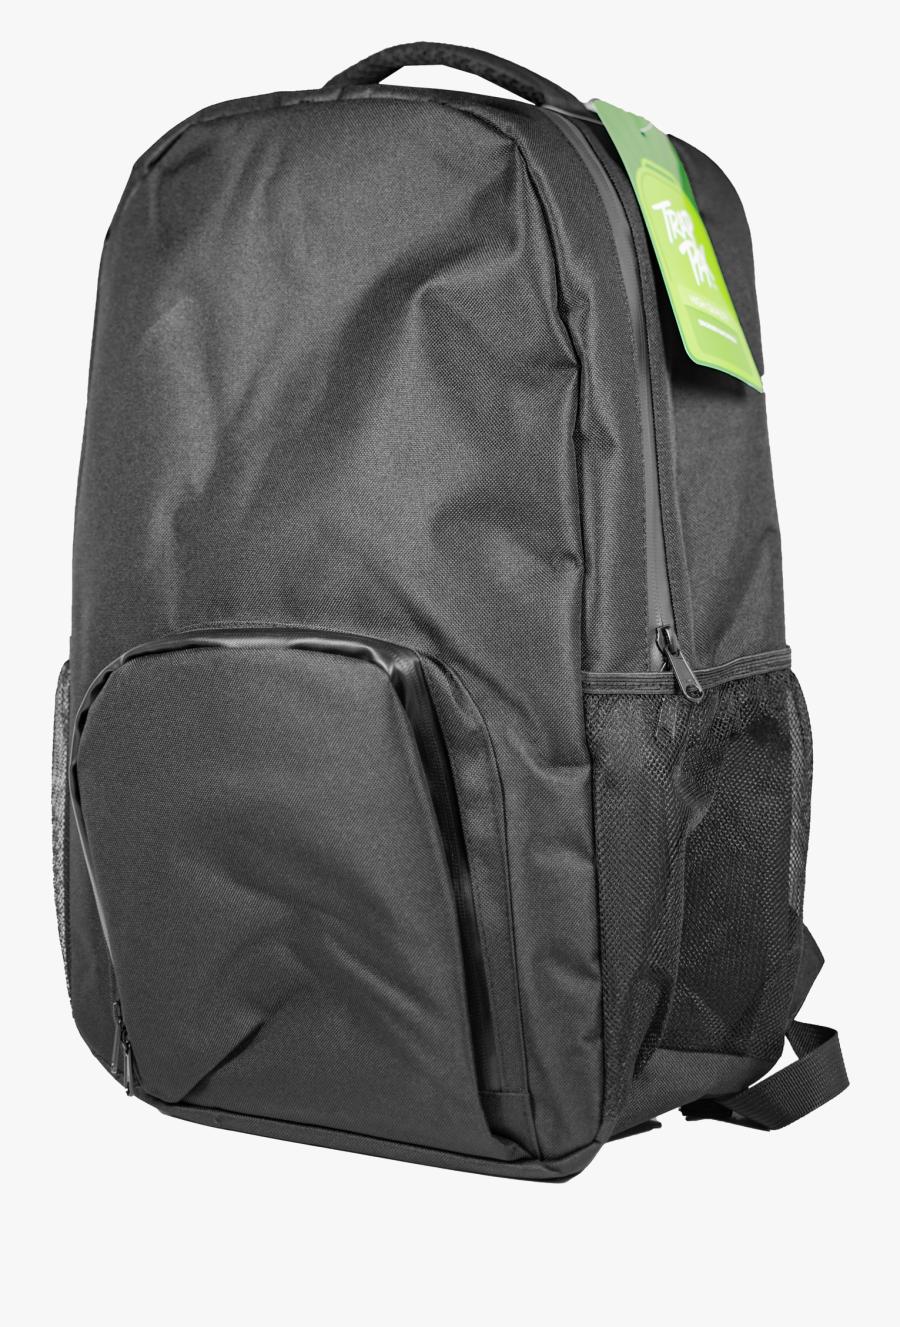 Transparent Christmas Shopping Bag Clipart - Laptop Bag, Transparent Clipart